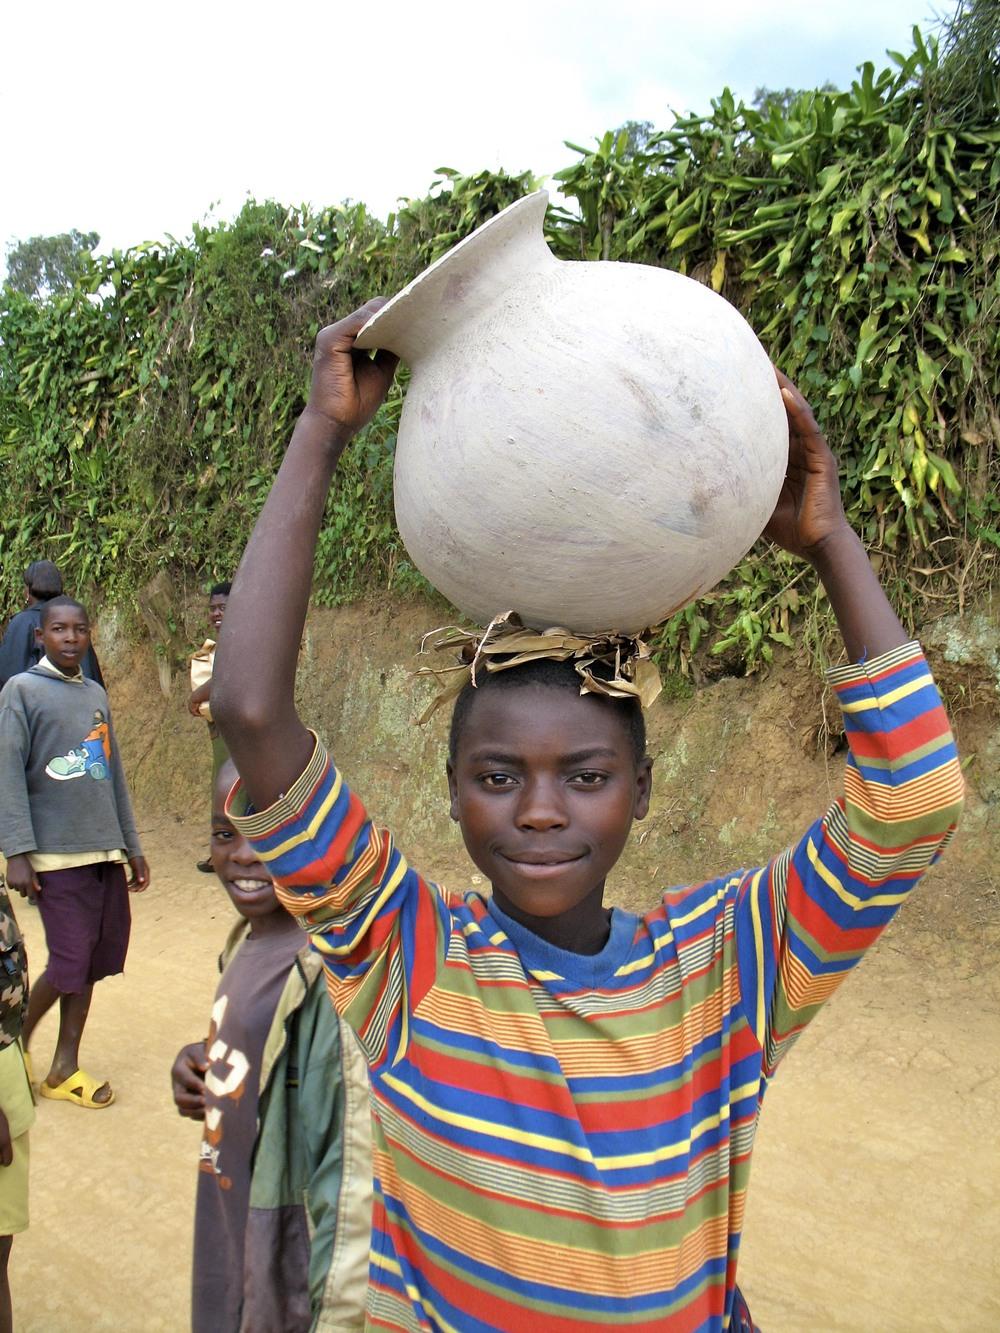 market-girl with jug.jpg